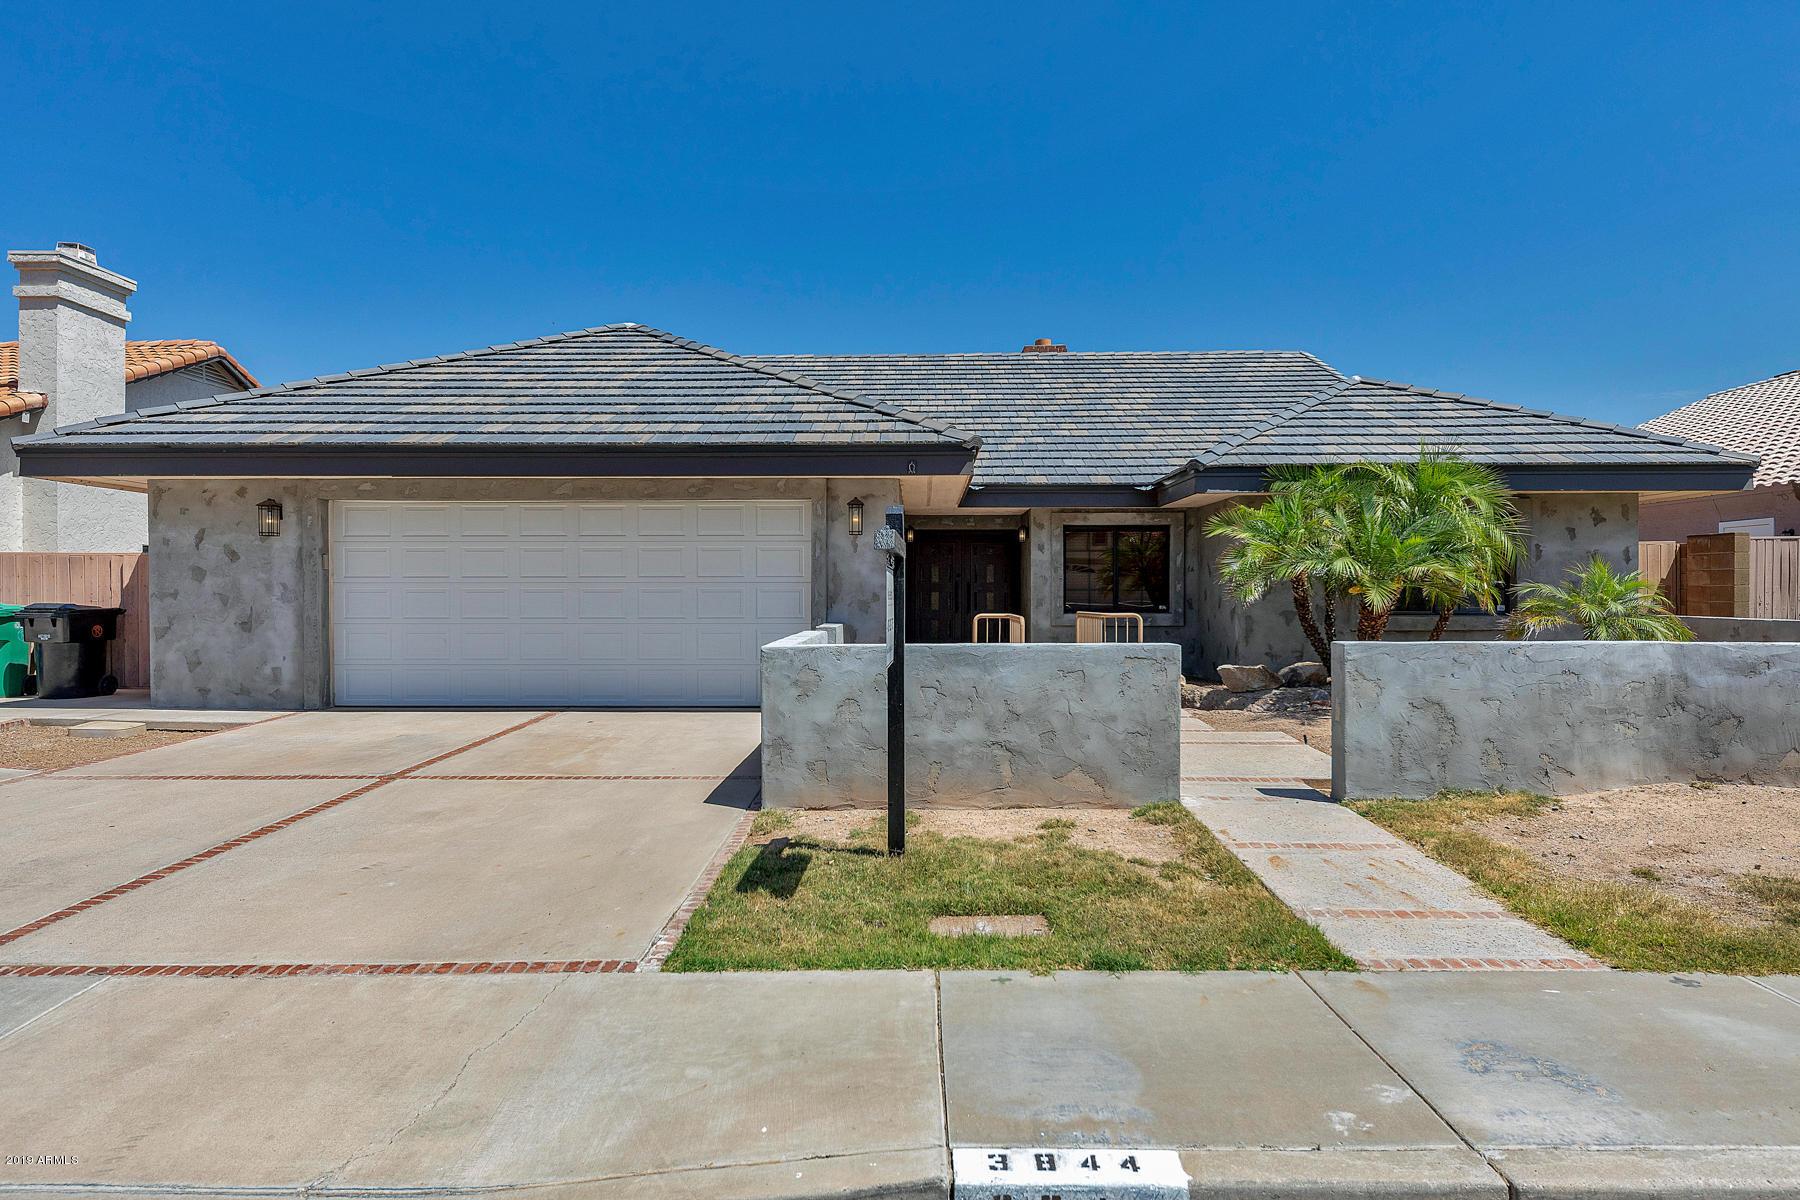 Photo of 3844 E DECATUR Street, Mesa, AZ 85205